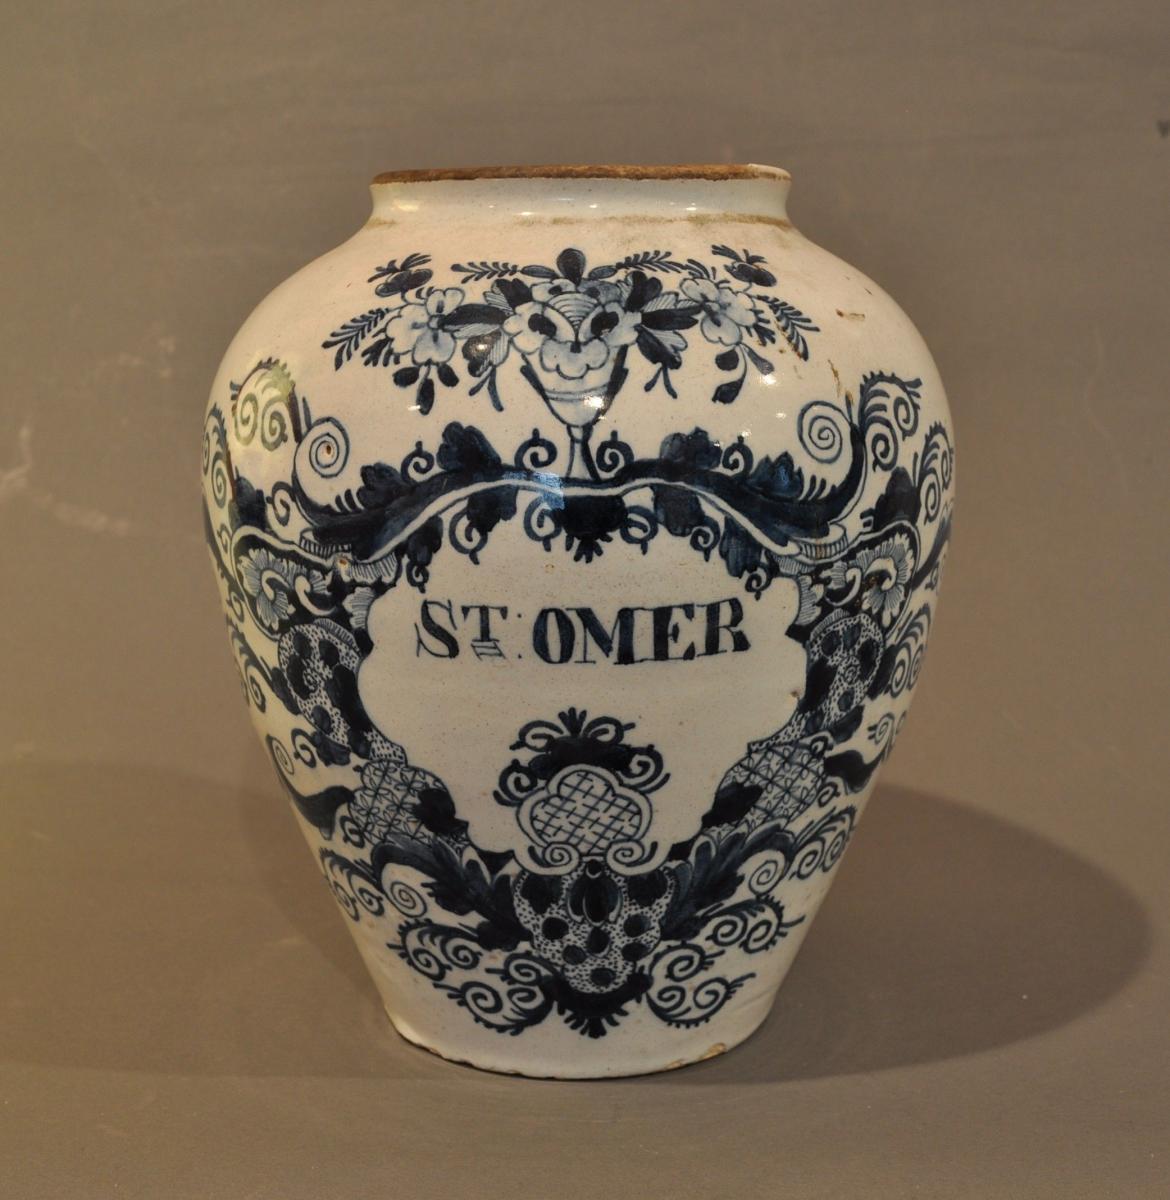 "10 inch Delft Tobacco jar """"St Omer"""""